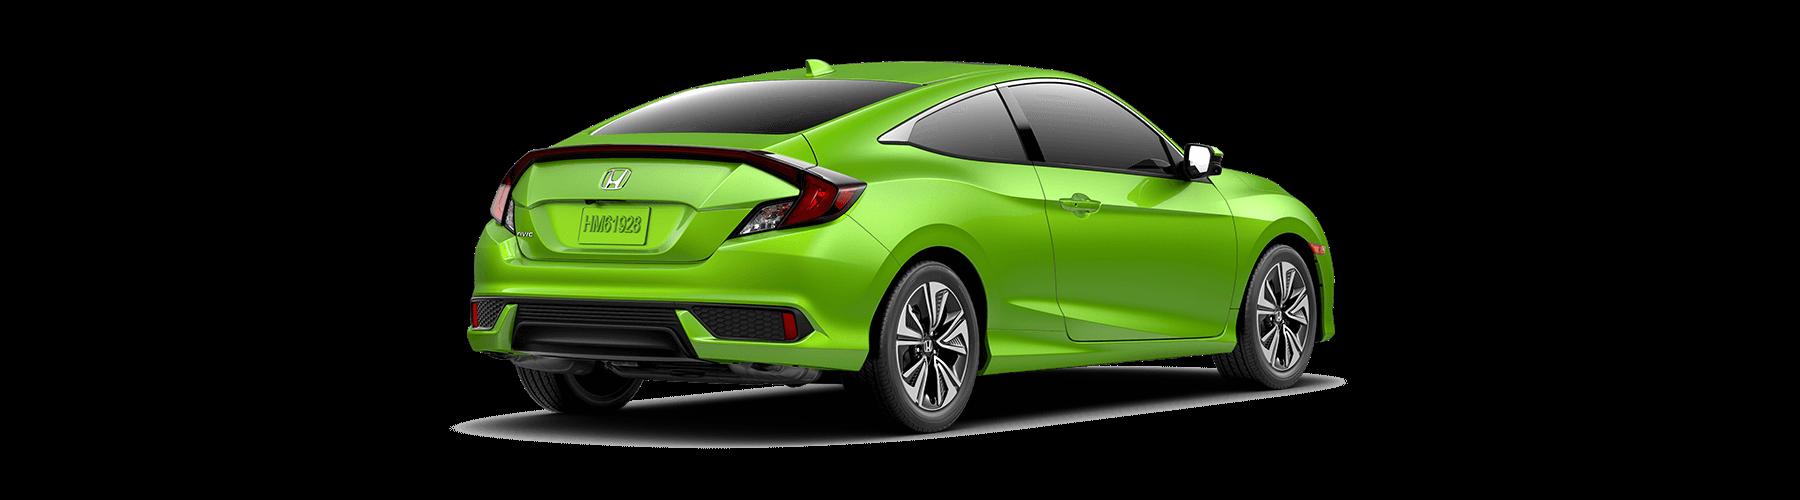 2017 Honda Civic Coupe Rear Angle